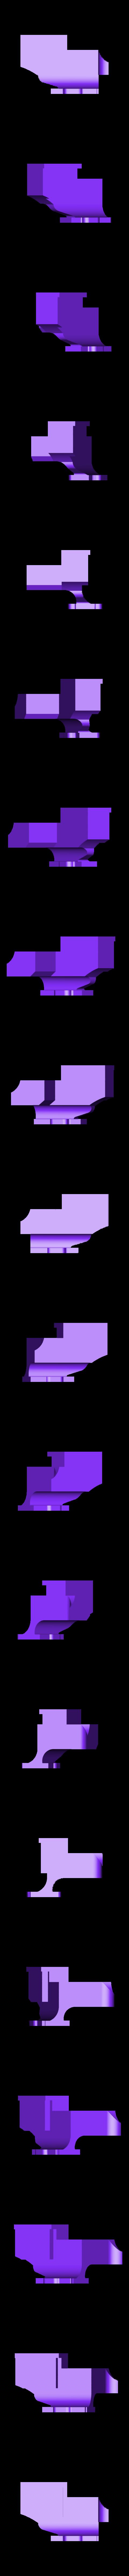 Front_Engine_-_Part_6-arm_2.STL Download free STL file 4-8-8-4 Big Boy Locomotive • 3D printer object, RaymondDeLuca